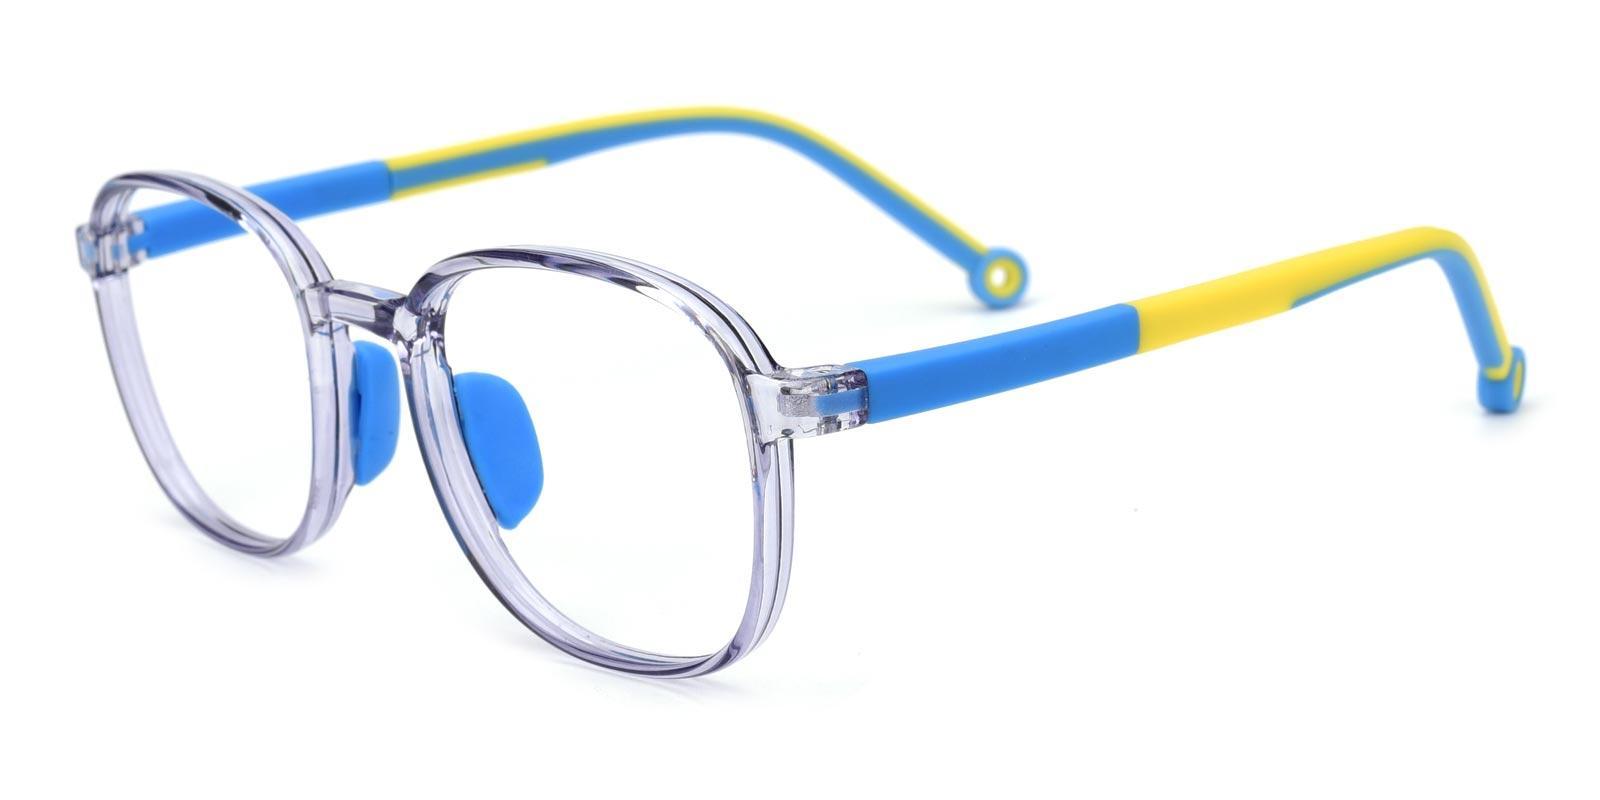 Warren-Blue-Rectangle-Plastic-Eyeglasses-detail